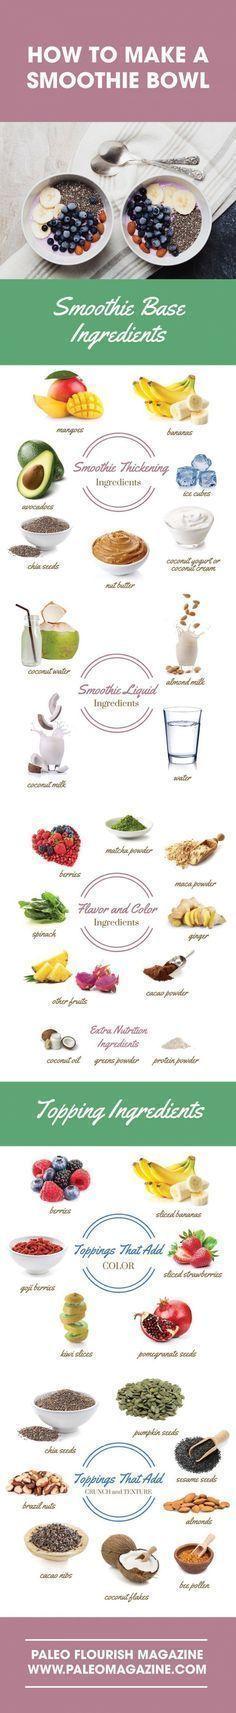 how to make a smoothie bowl infographic #paleo #primal #smoothiebowl #recipe https://paleoflourish.com/what-is-a-smoothie-bowl-how-to-make-a-smoothie-bowl